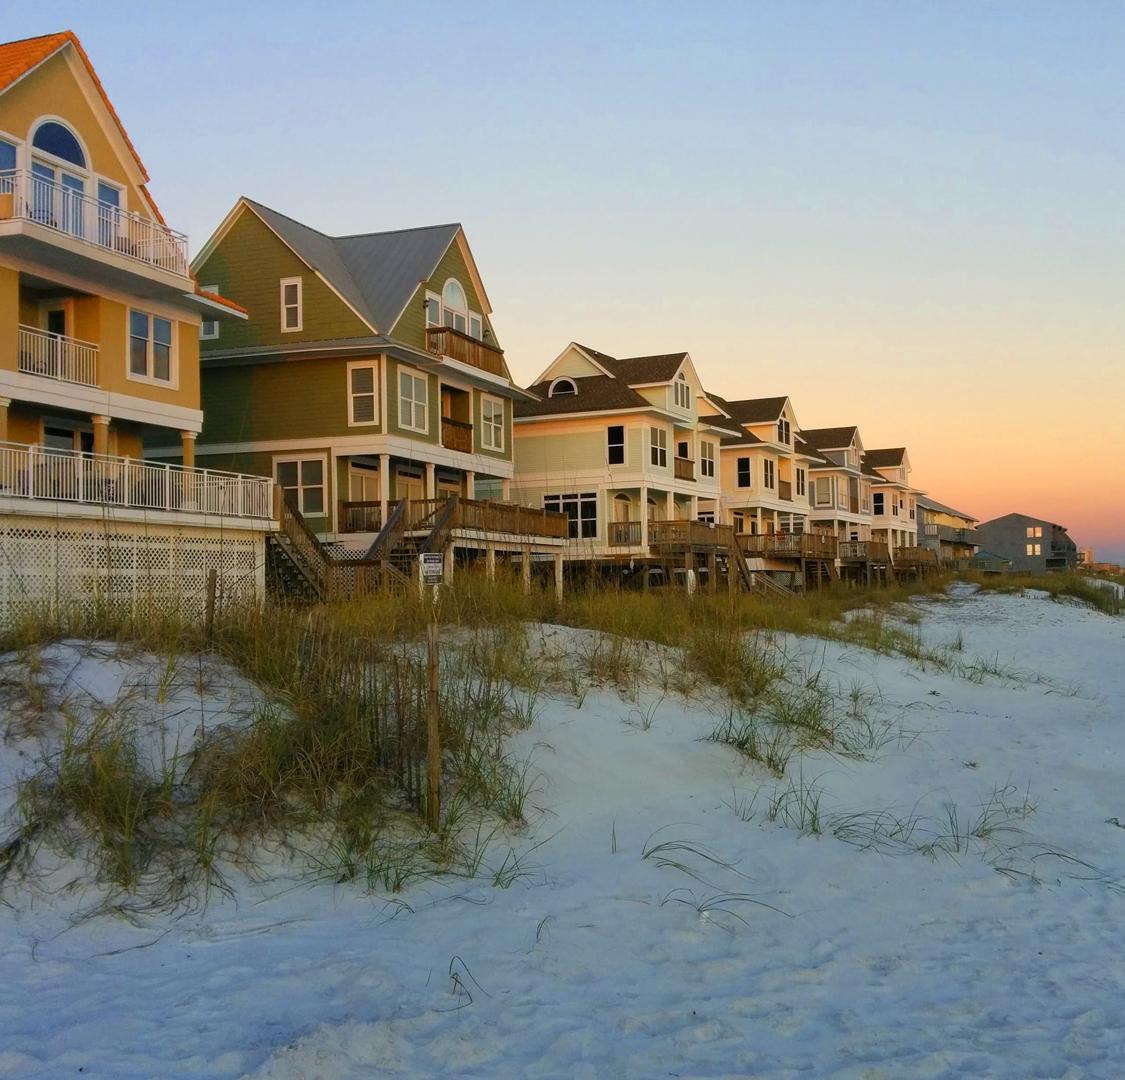 snowbird considerations, beach homes on Miramar Beach Florida